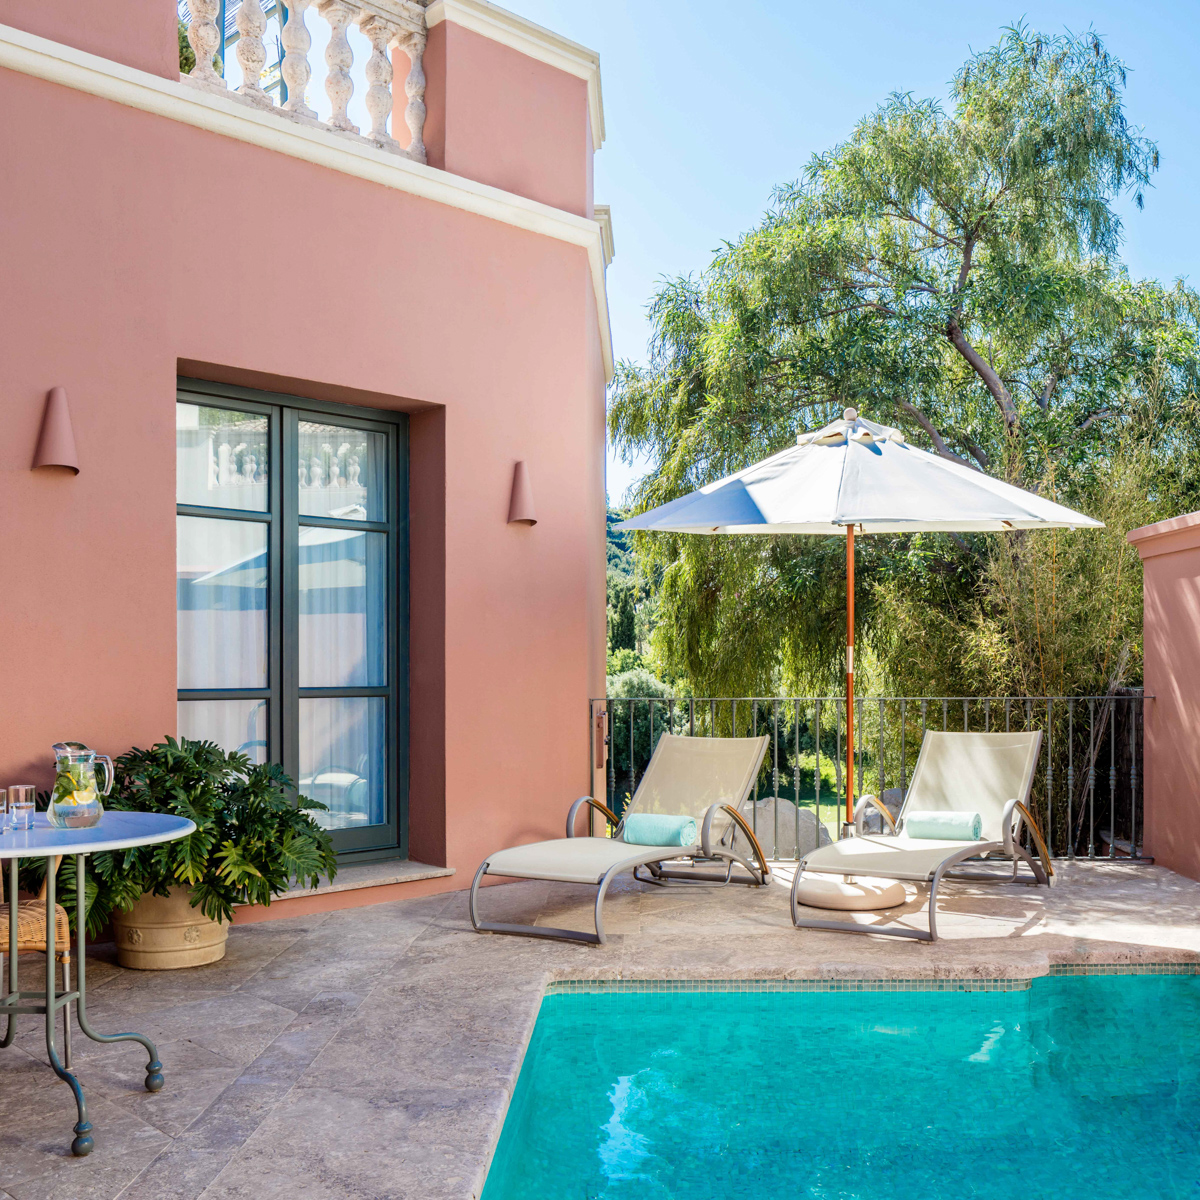 Anantara Luxus Hotel in Marbella-5